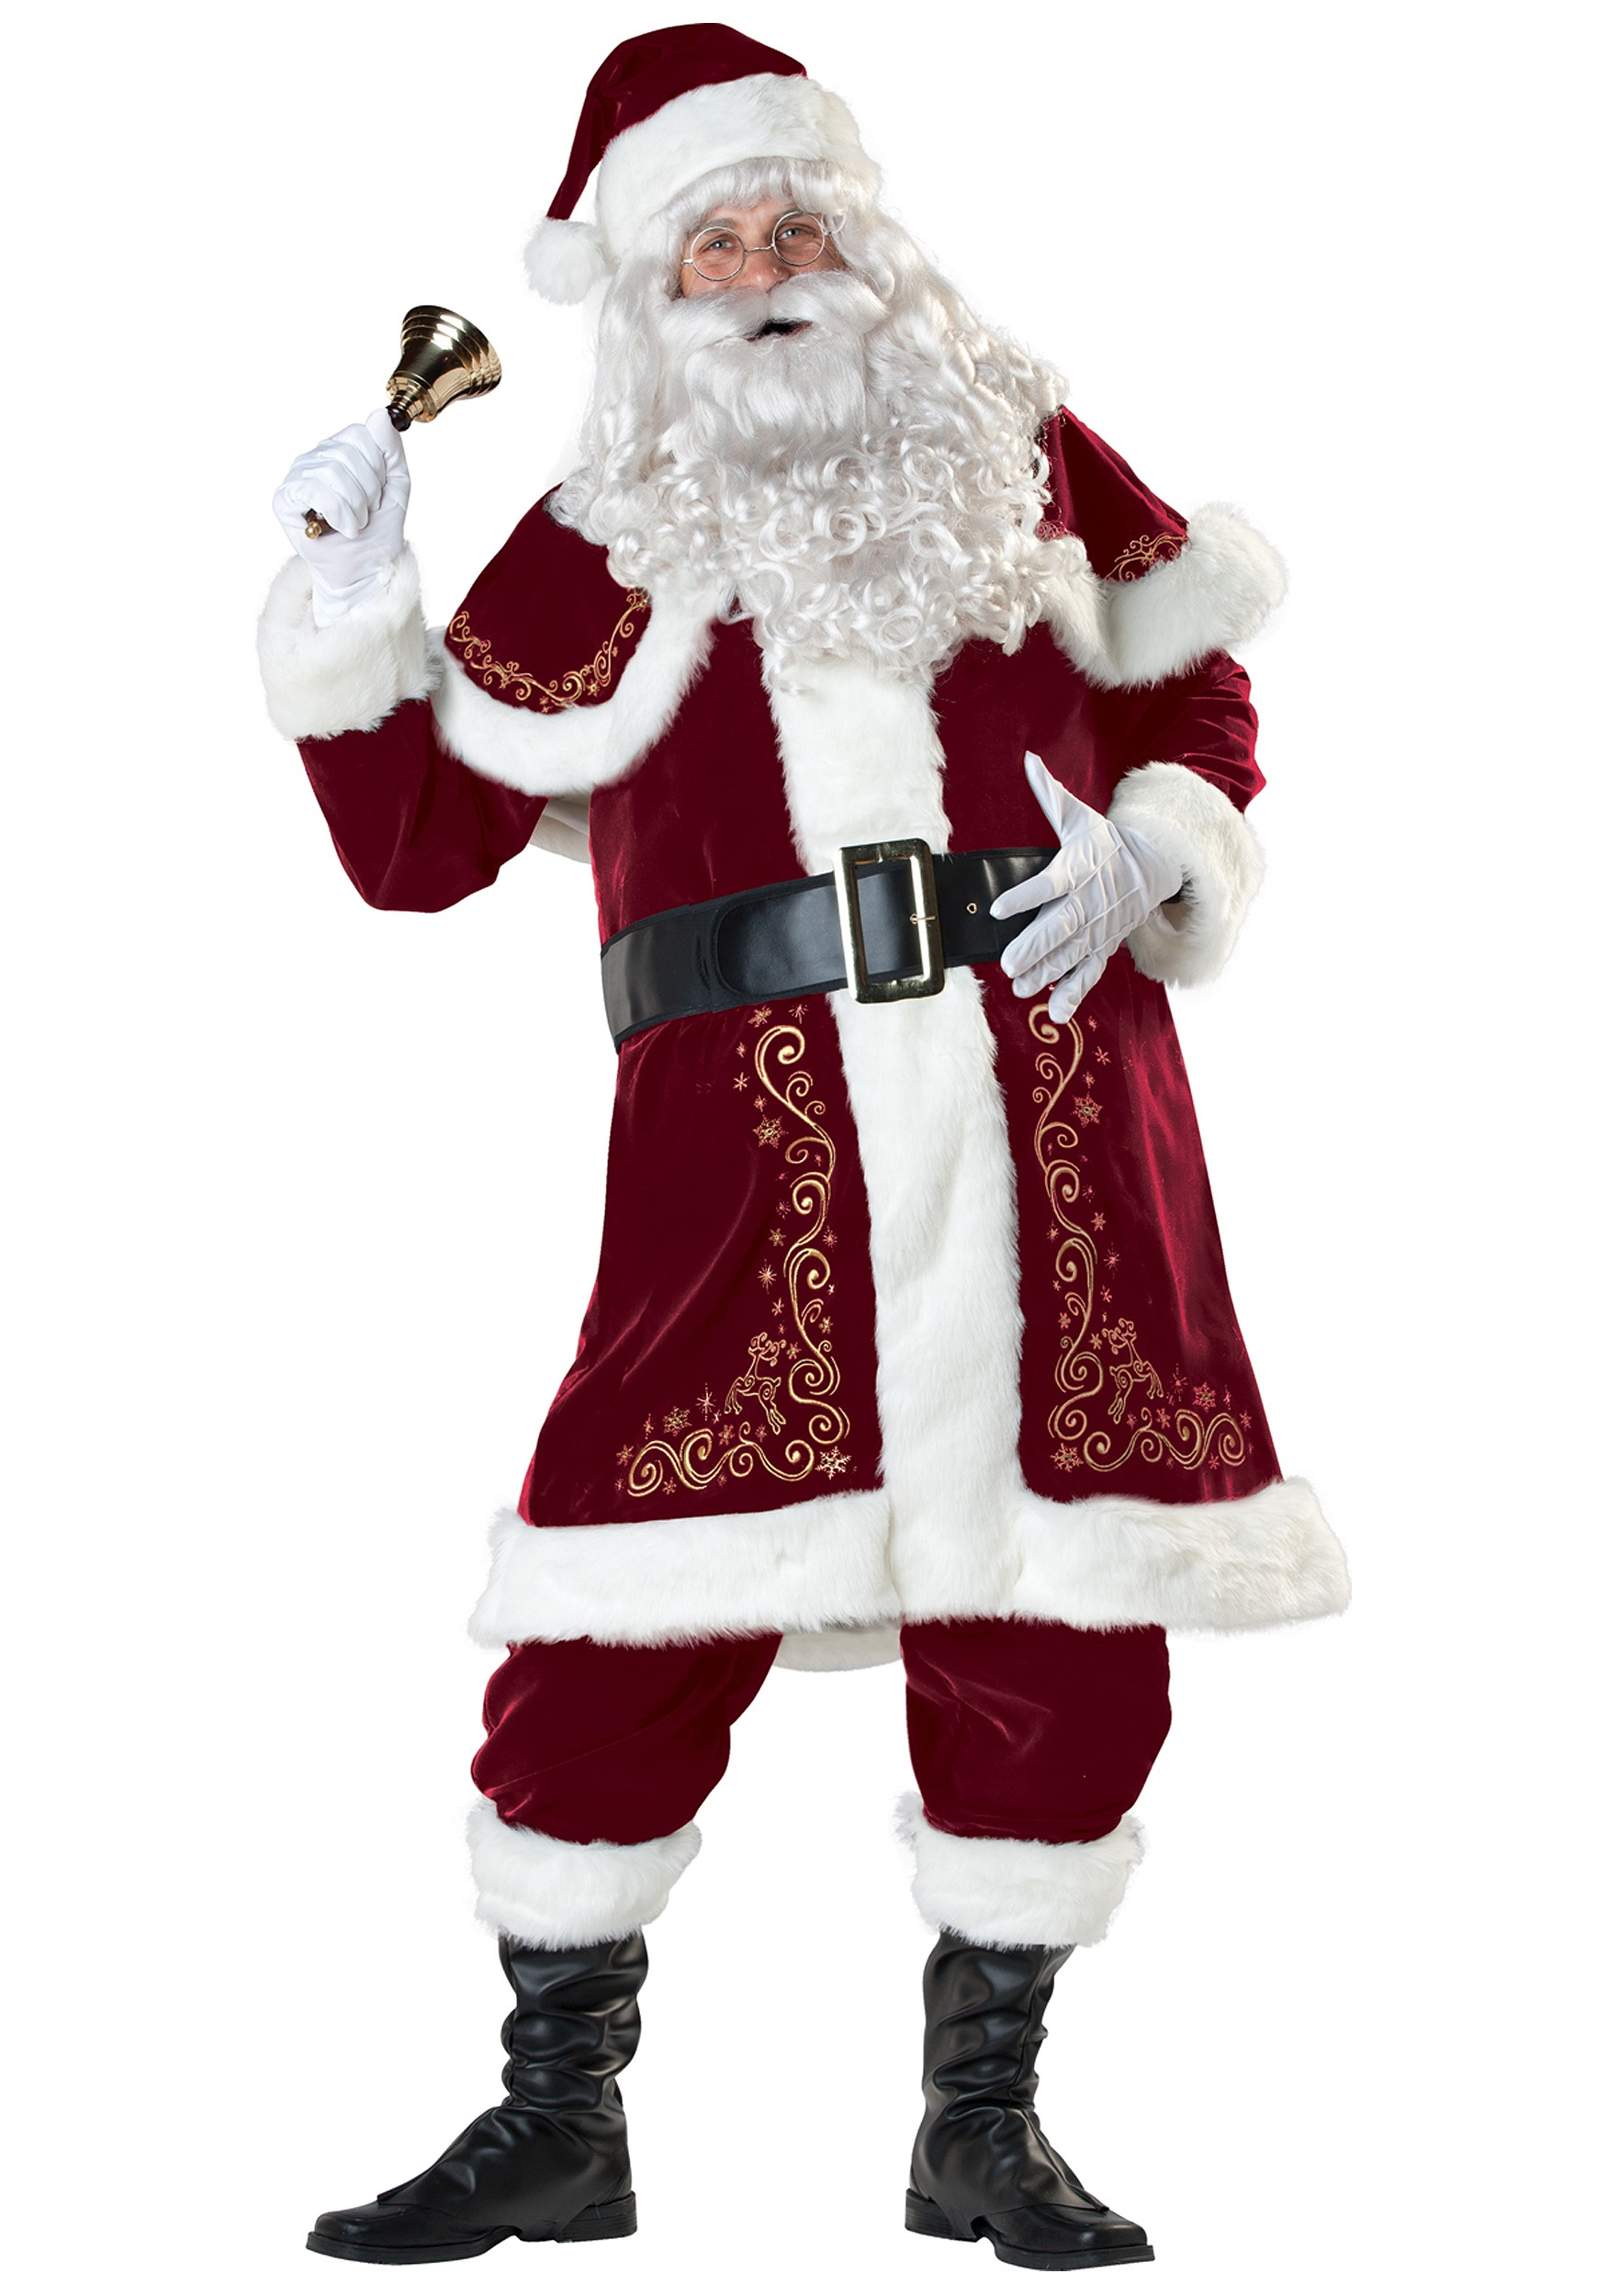 76c57d1ac6b Classic St. Nick Santa Costume - Adult Santa Claus Costumes